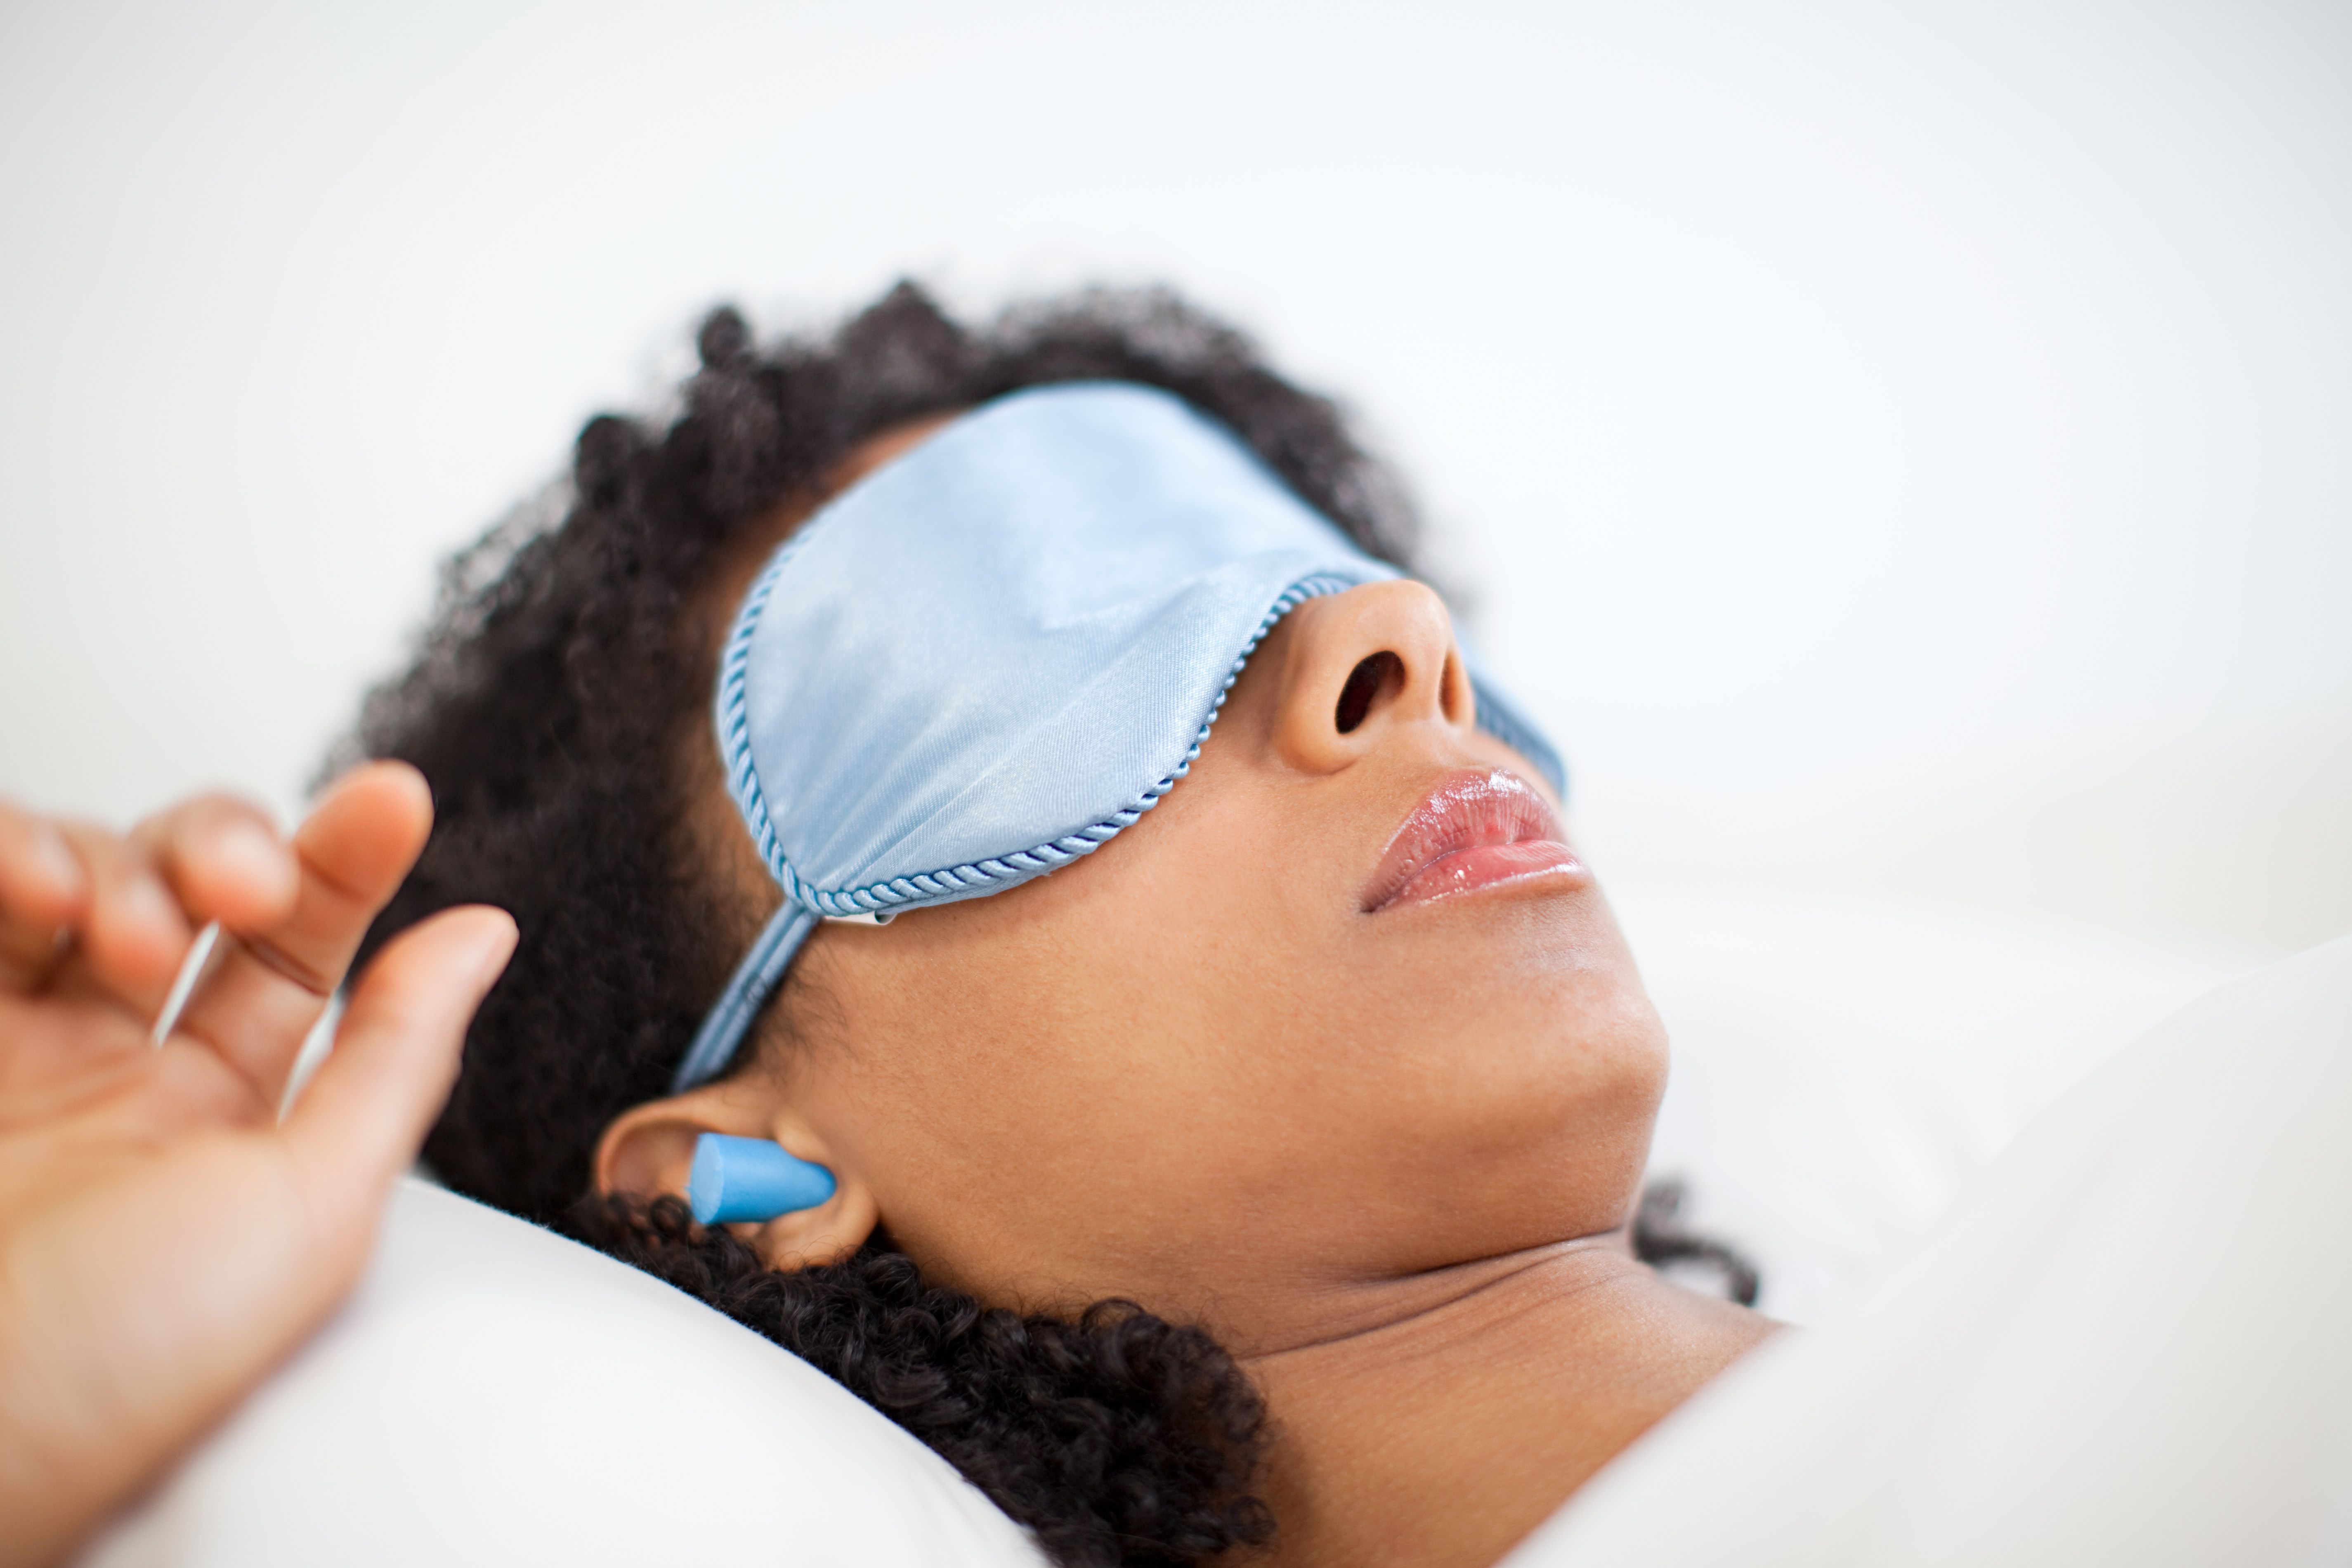 7 Best Earplugs for Better Sleep